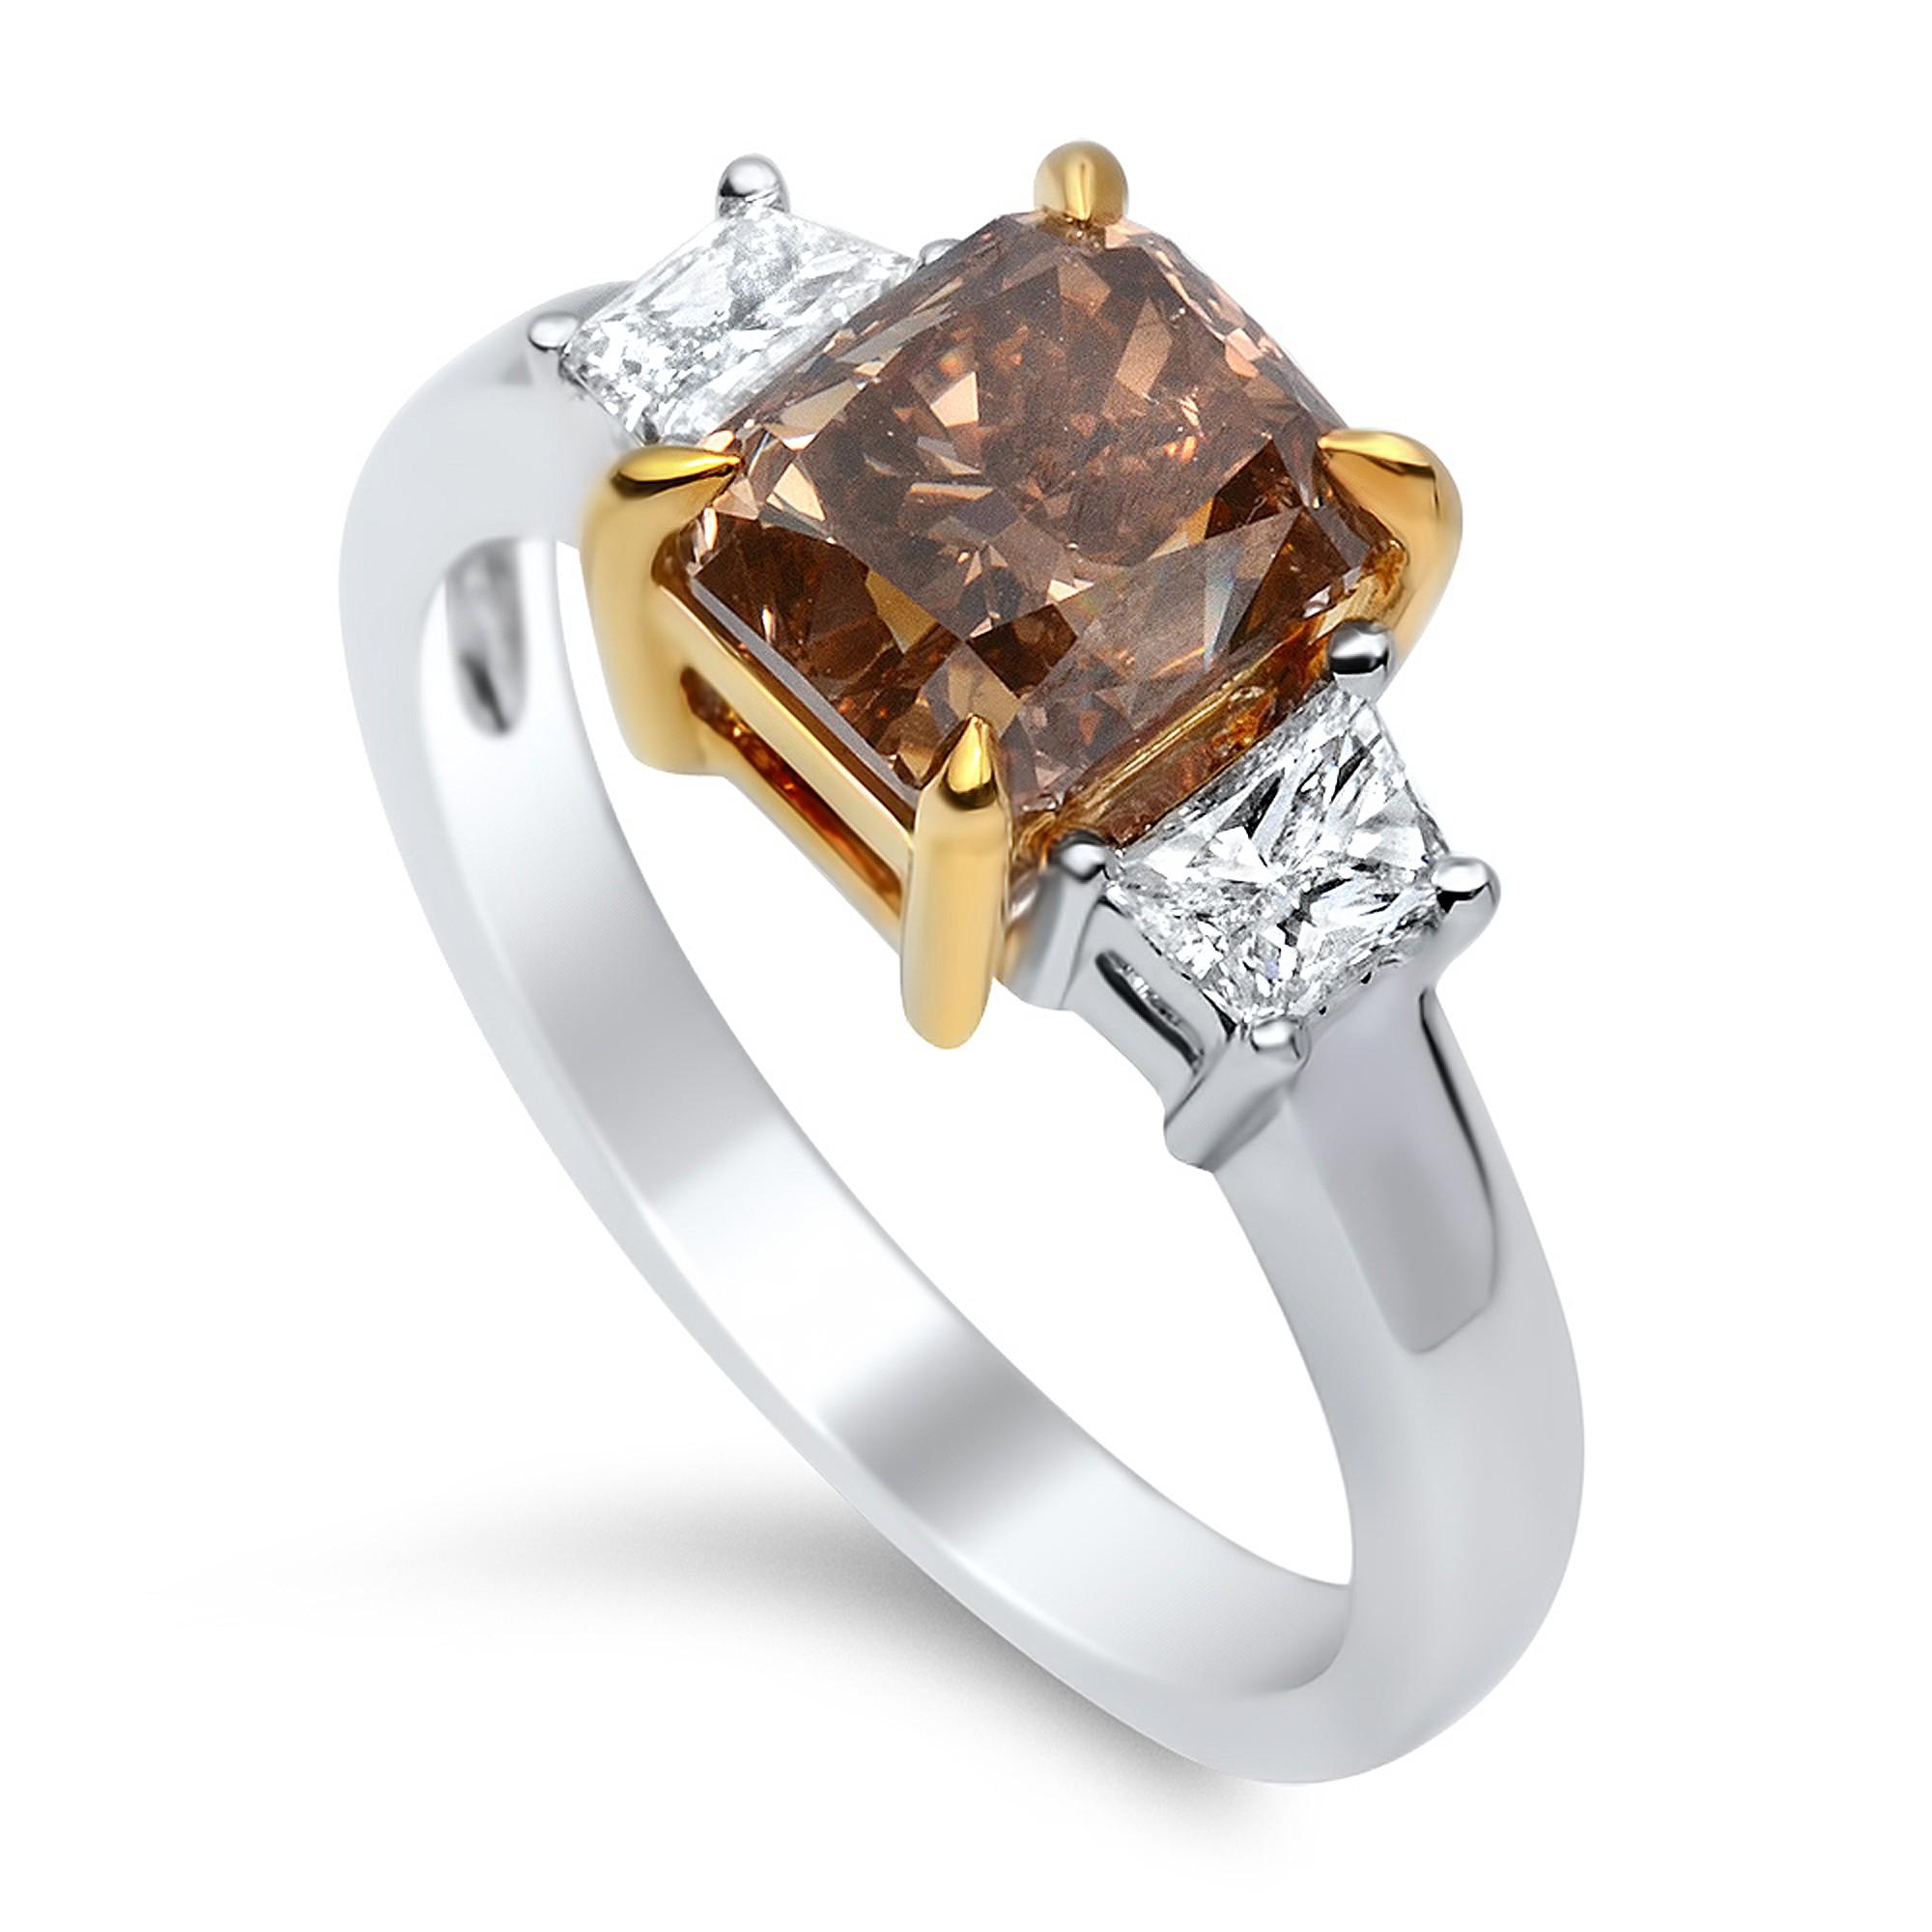 2.72 Carat Fancy Dark Orangy Brown Diamond Ring in 18K Two-Tone Gold